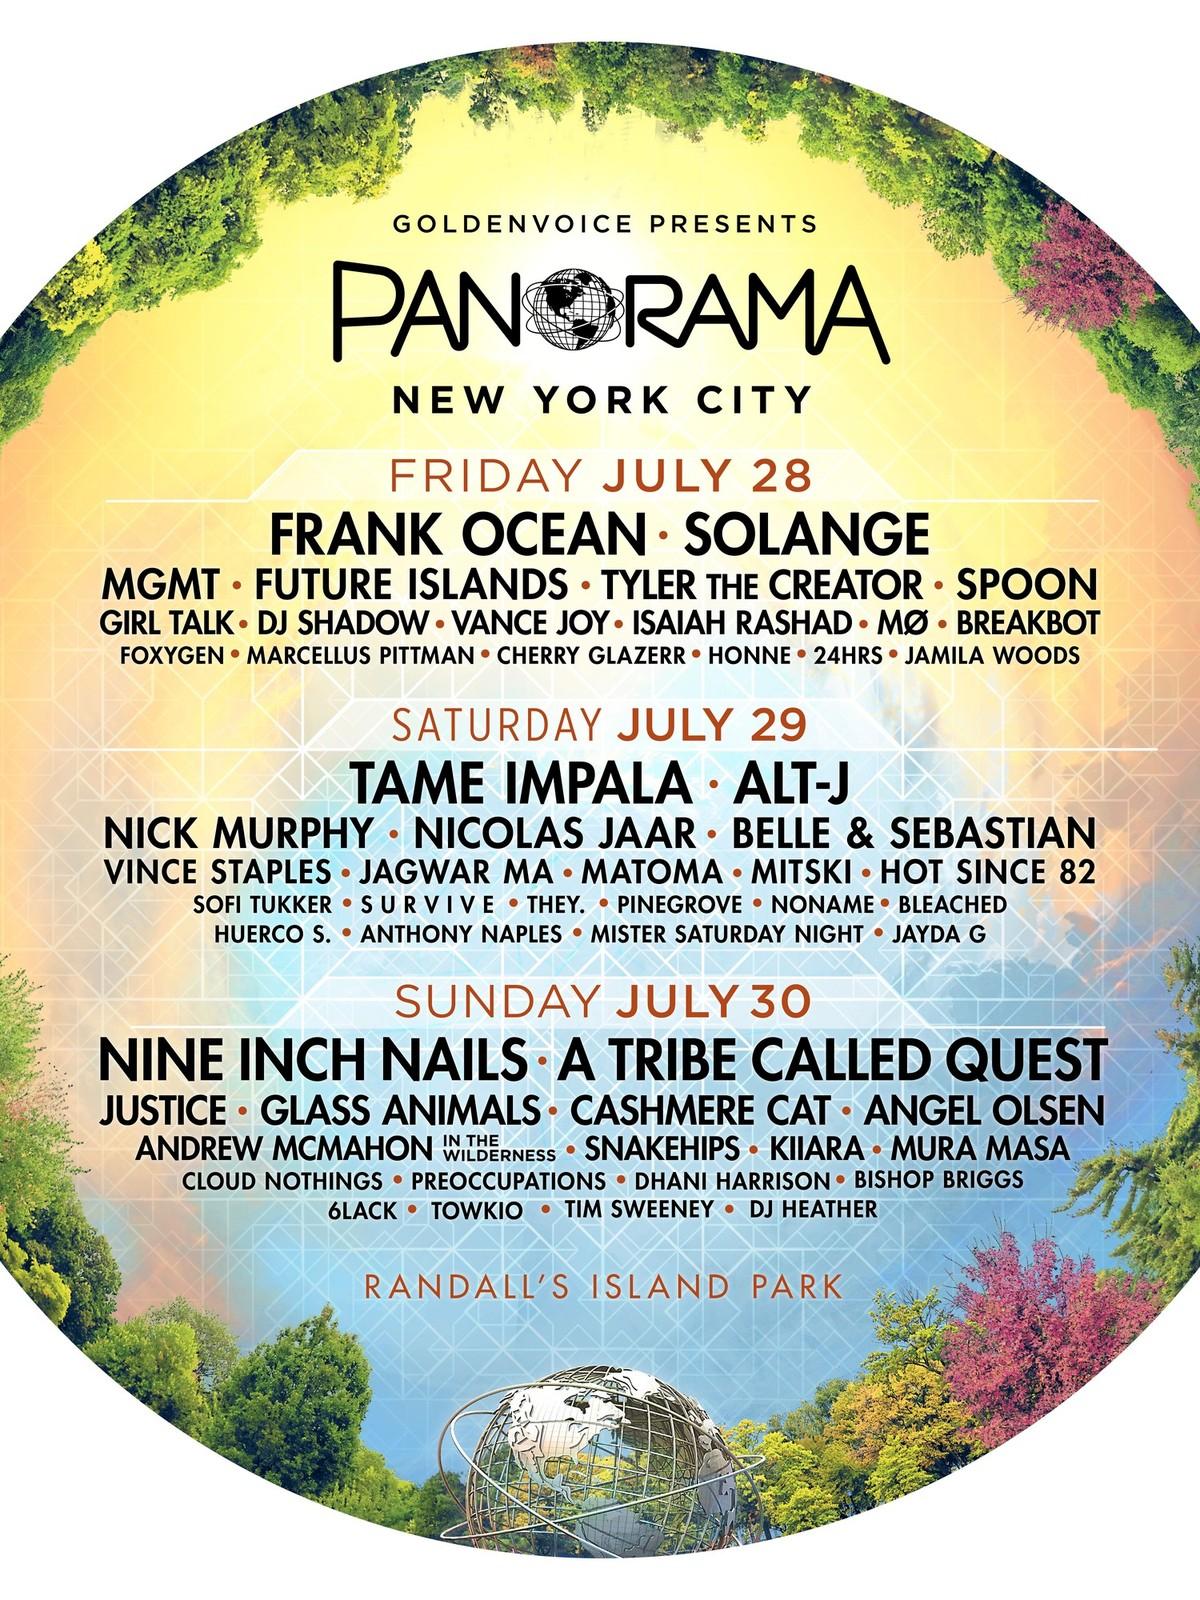 www.panorama.nyc